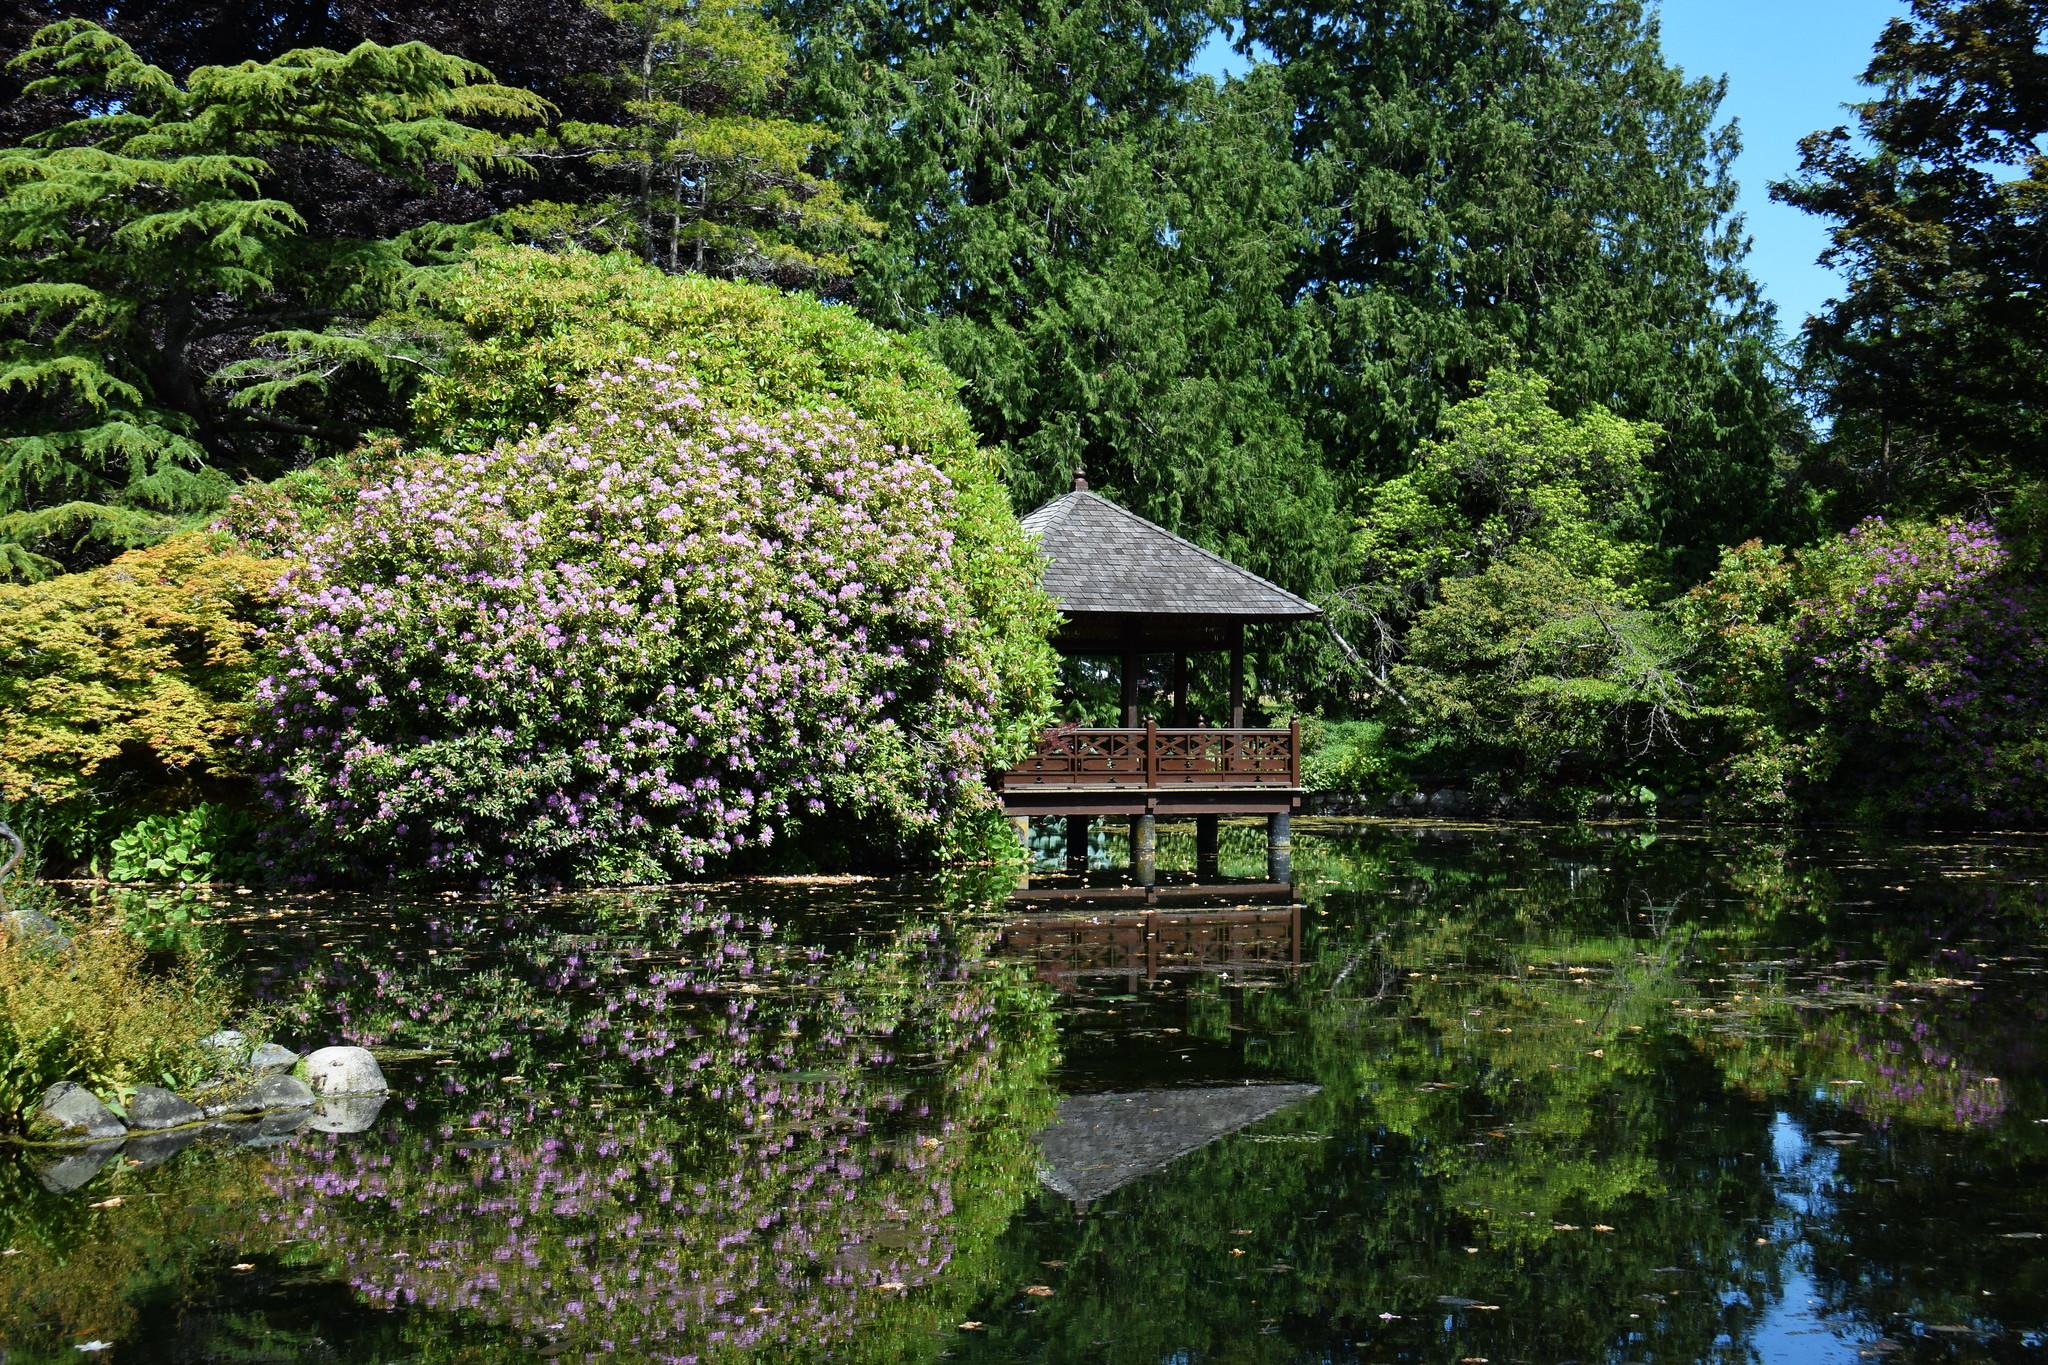 Japanese Garden | Flickr - Photo Sharing!